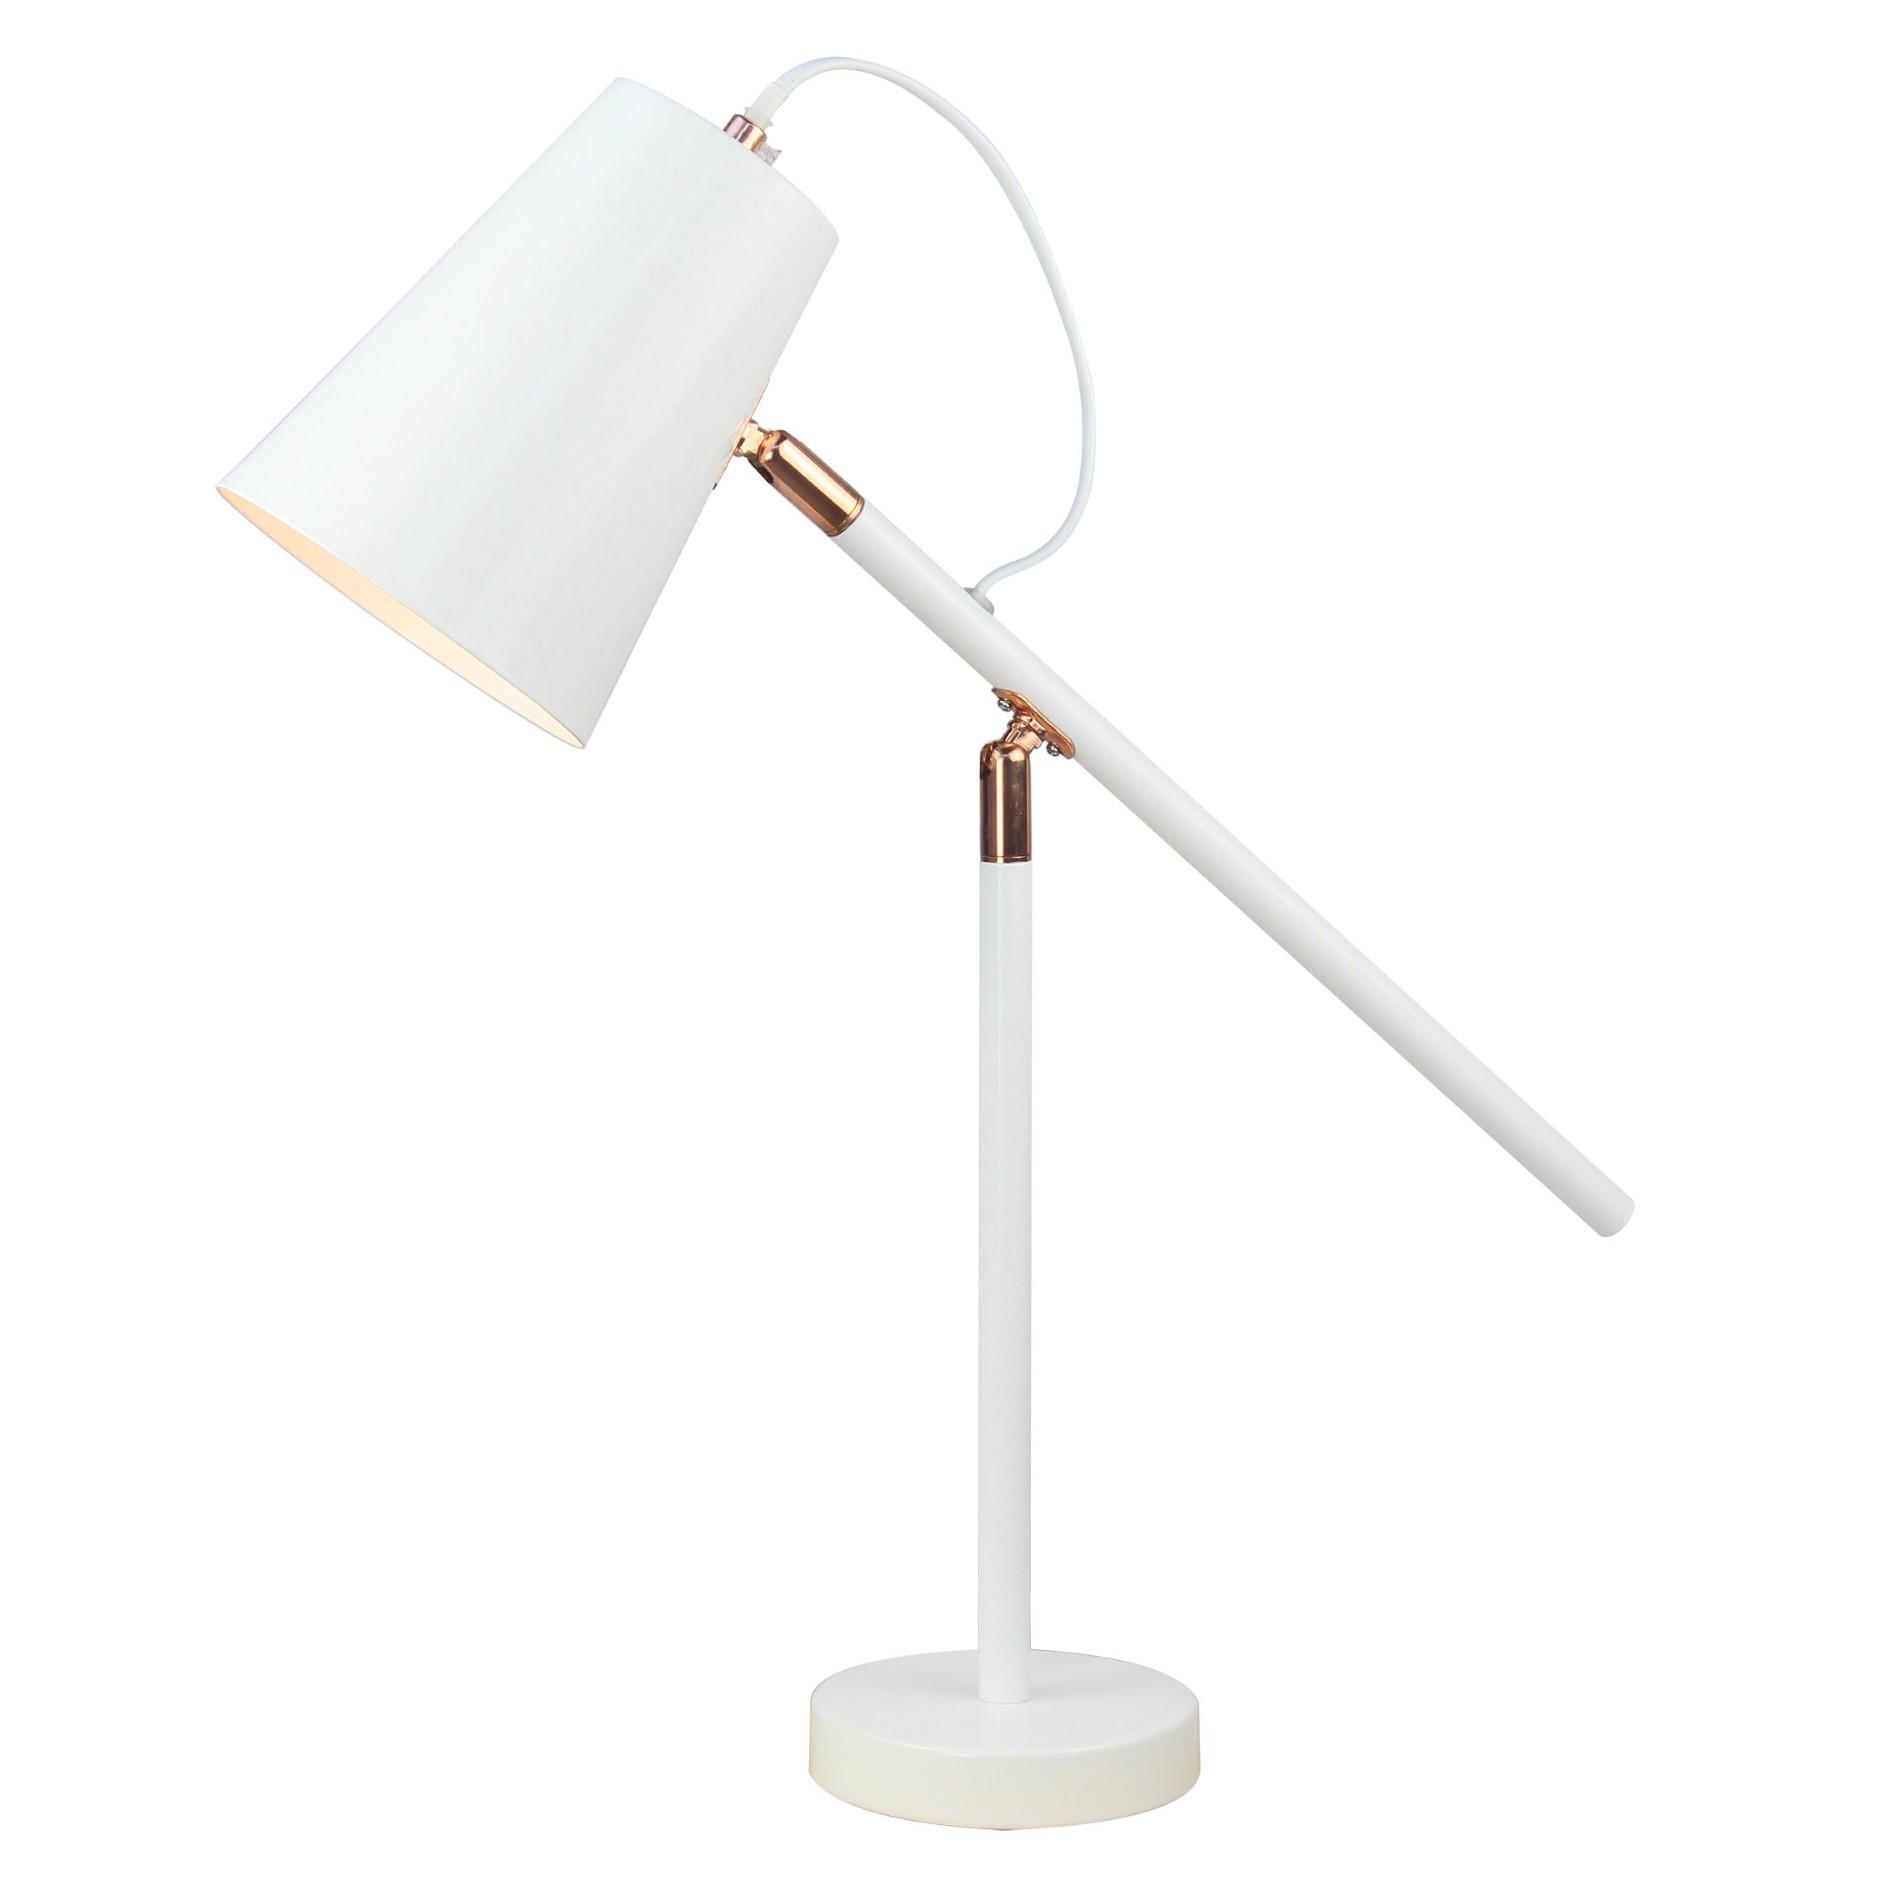 Luminaria de Mesa Metal Articulada Branca e Cobre E27 6022 - Ecoline